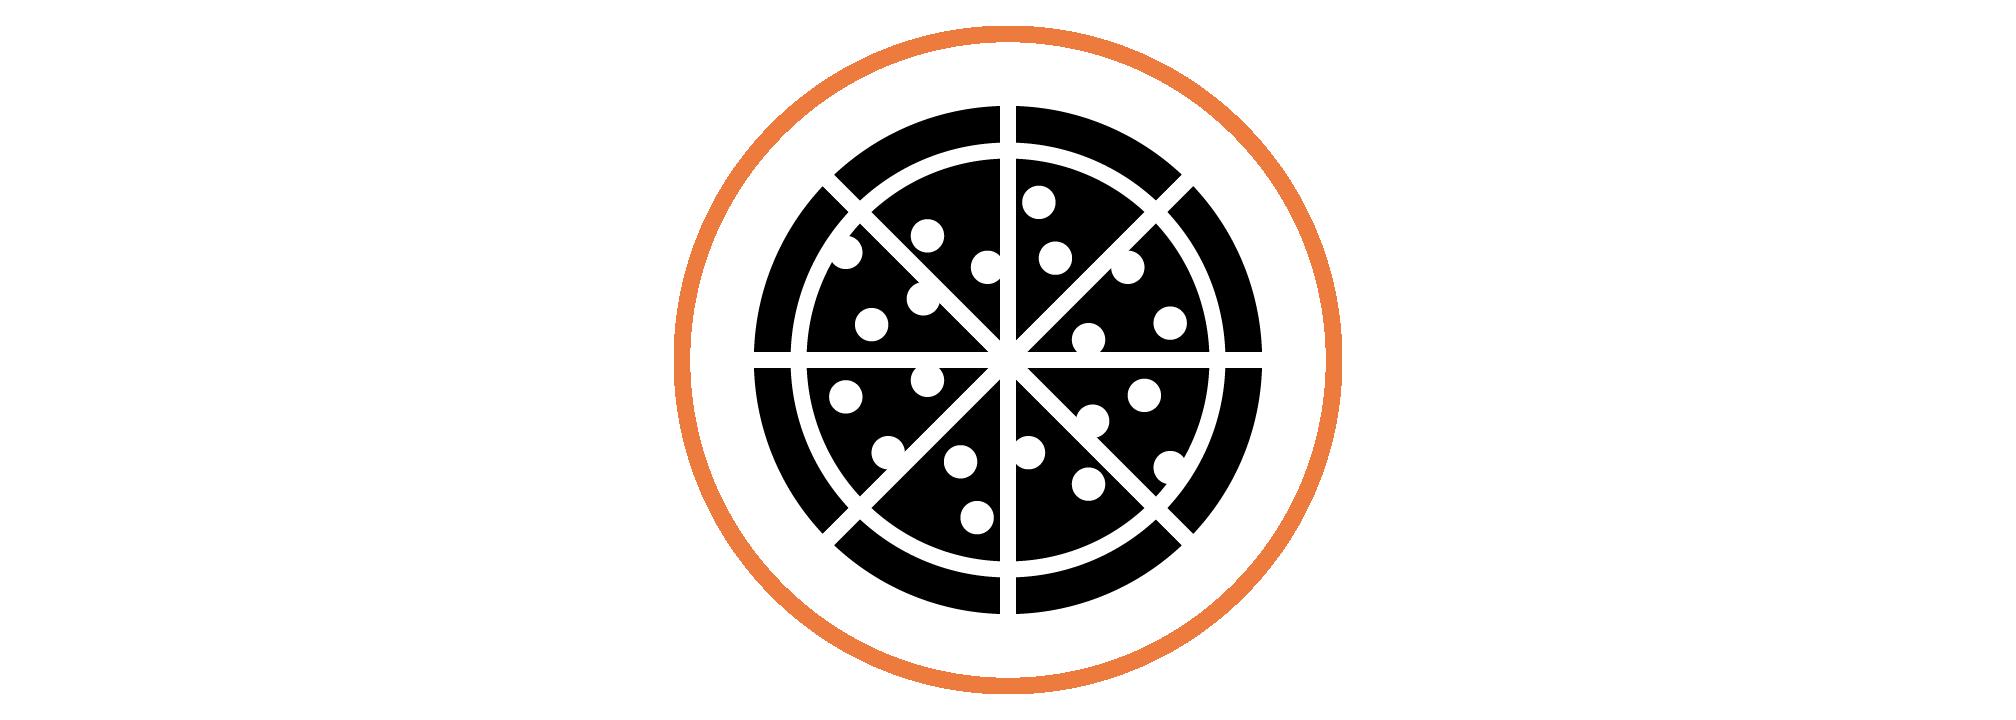 icon-rewards_4-wide.png